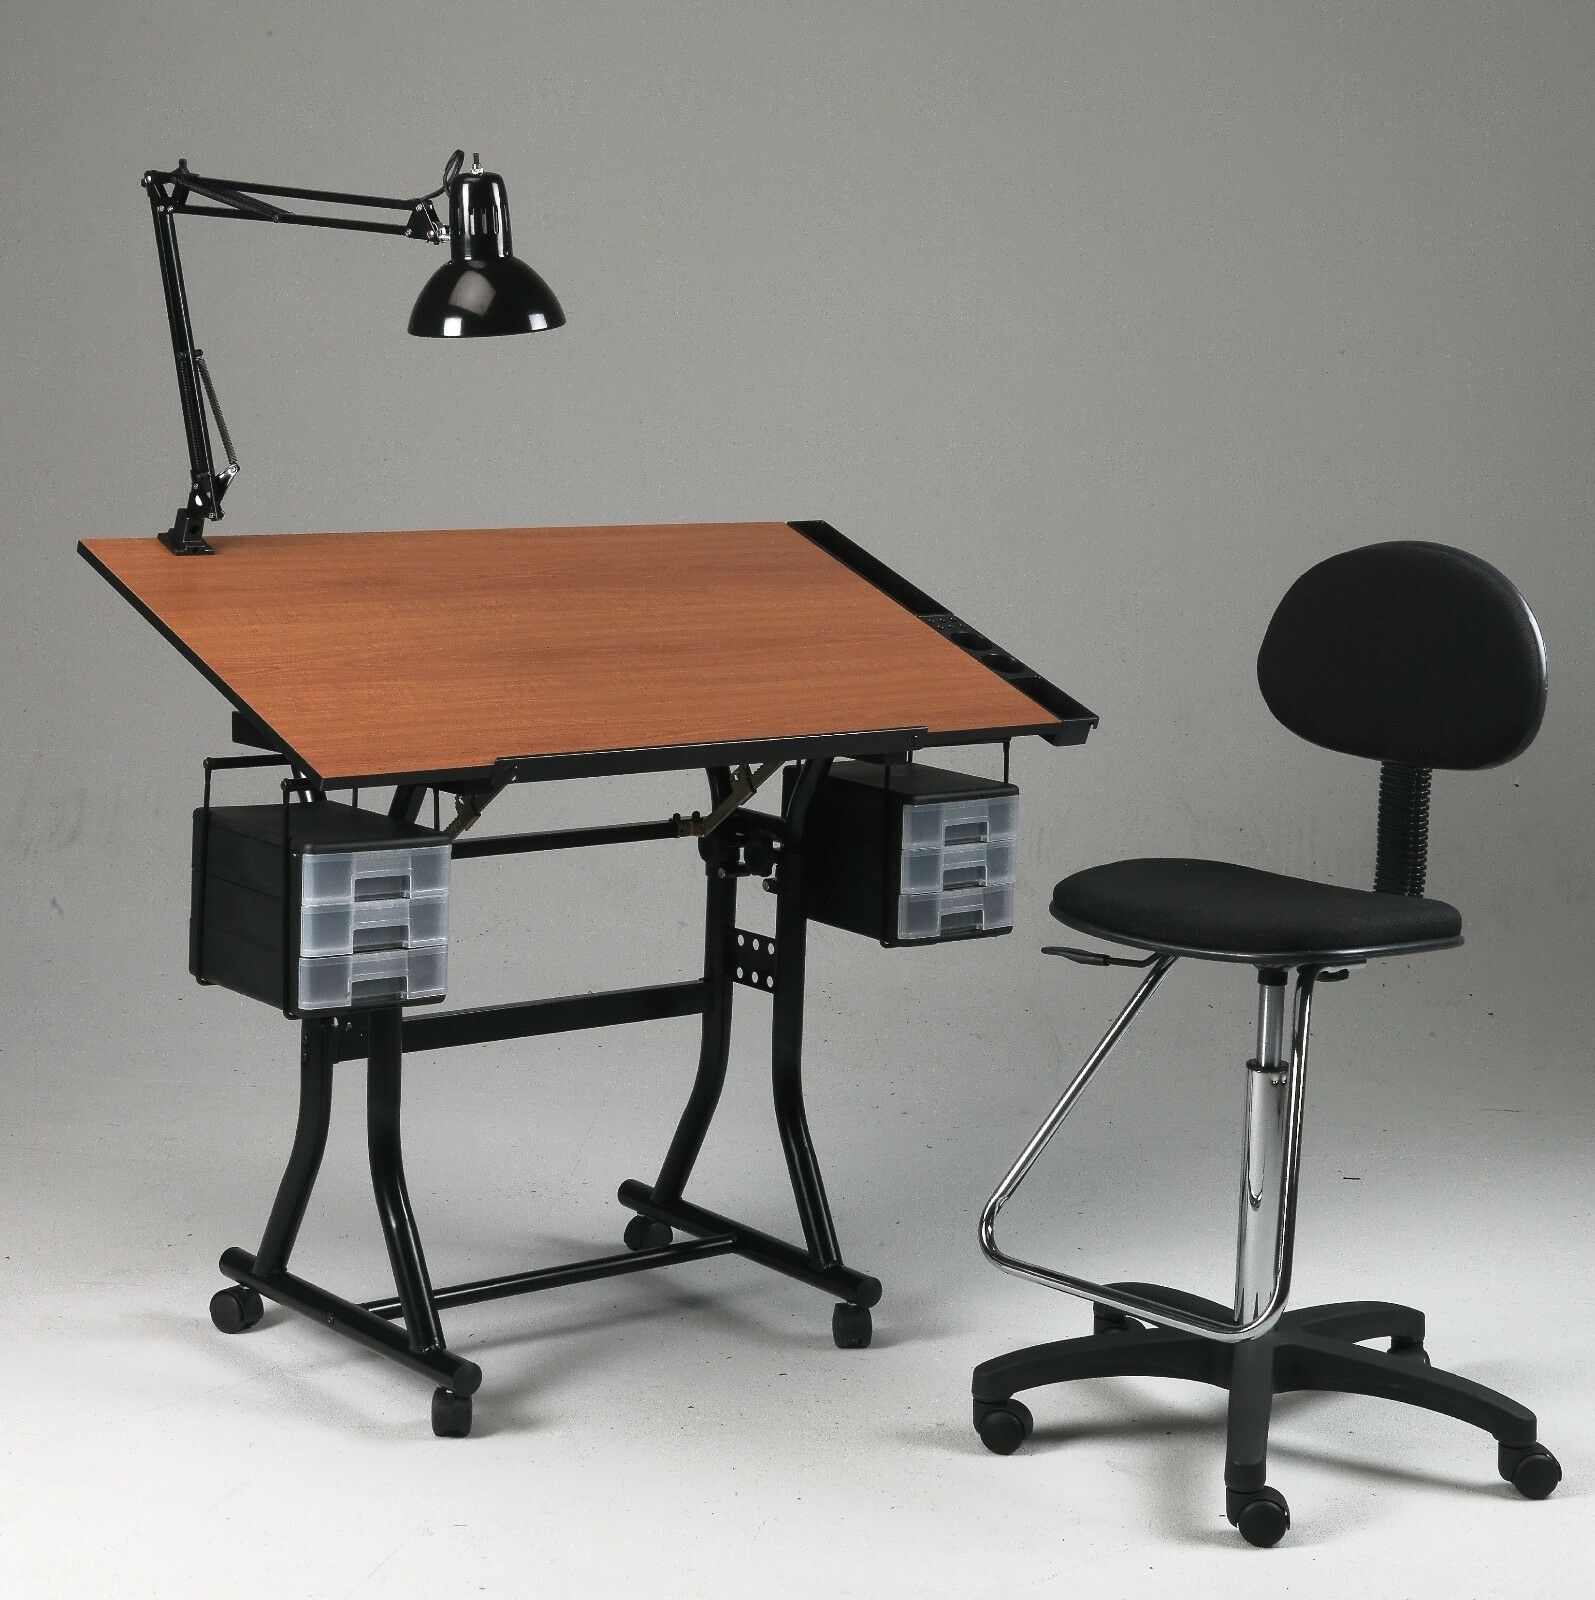 Black Drawing Art Hobby Craft Table Desk